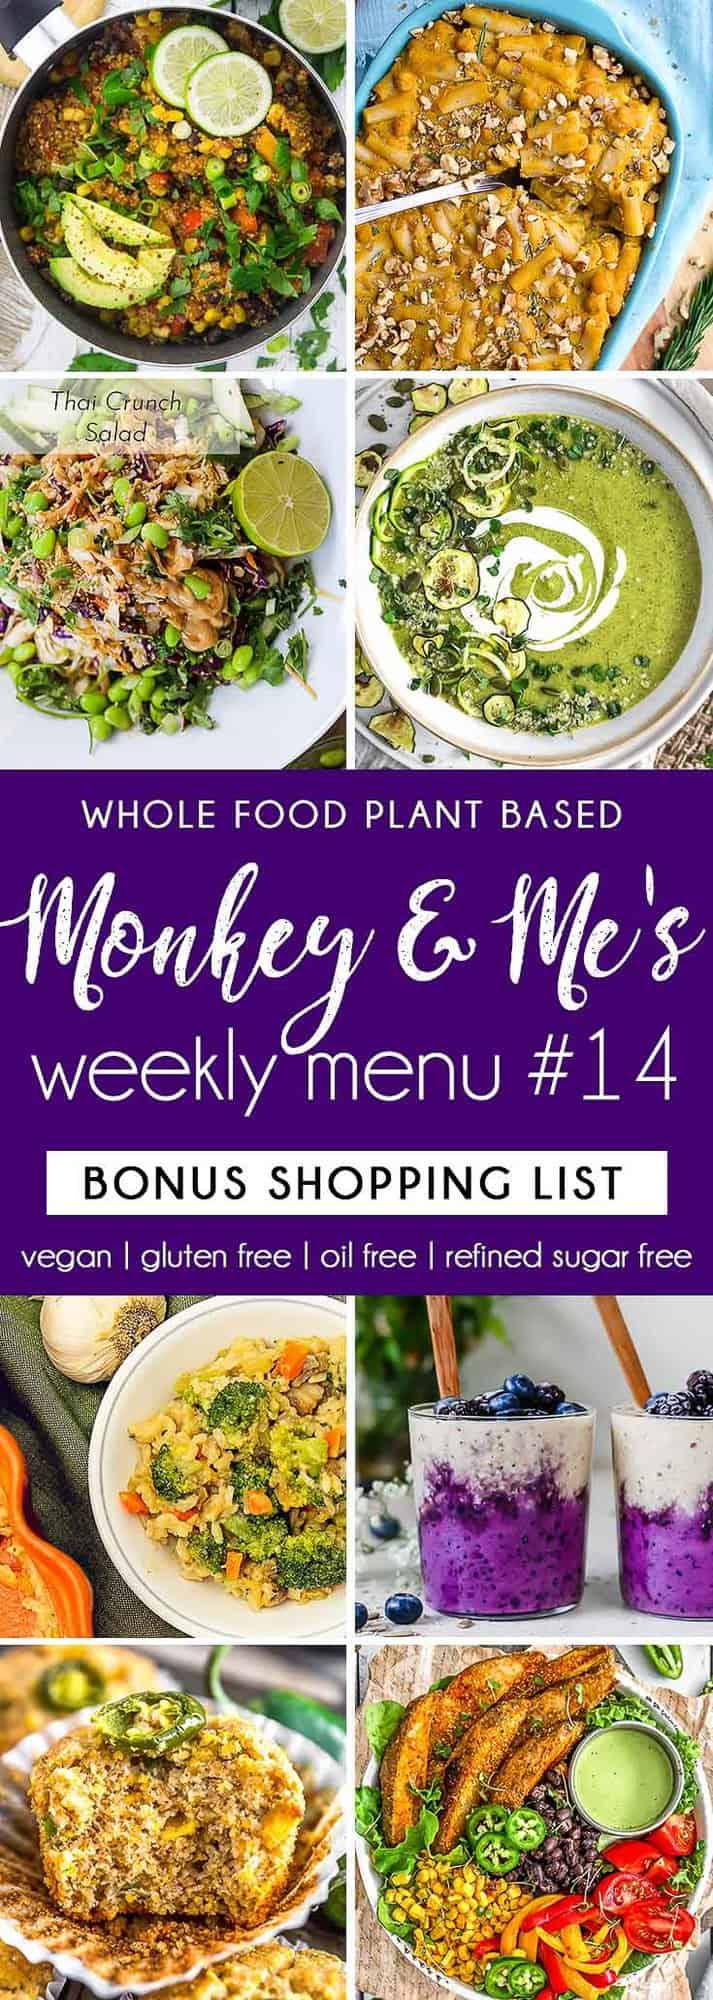 Monkey and Me's Menu, Menu 14, weekly recipe plan, menu, planner, plant based, vegan, vegetarian, whole food plant based, gluten free, recipe, wfpb, healthy, healthy vegan, oil free, no refined sugar, no oil, refined sugar free, dairy free, dinner, lunch, menu, plant based menu, vegan menu, weekly menu, meal plan, vegan meal plan, plant based meal plan, shopping list